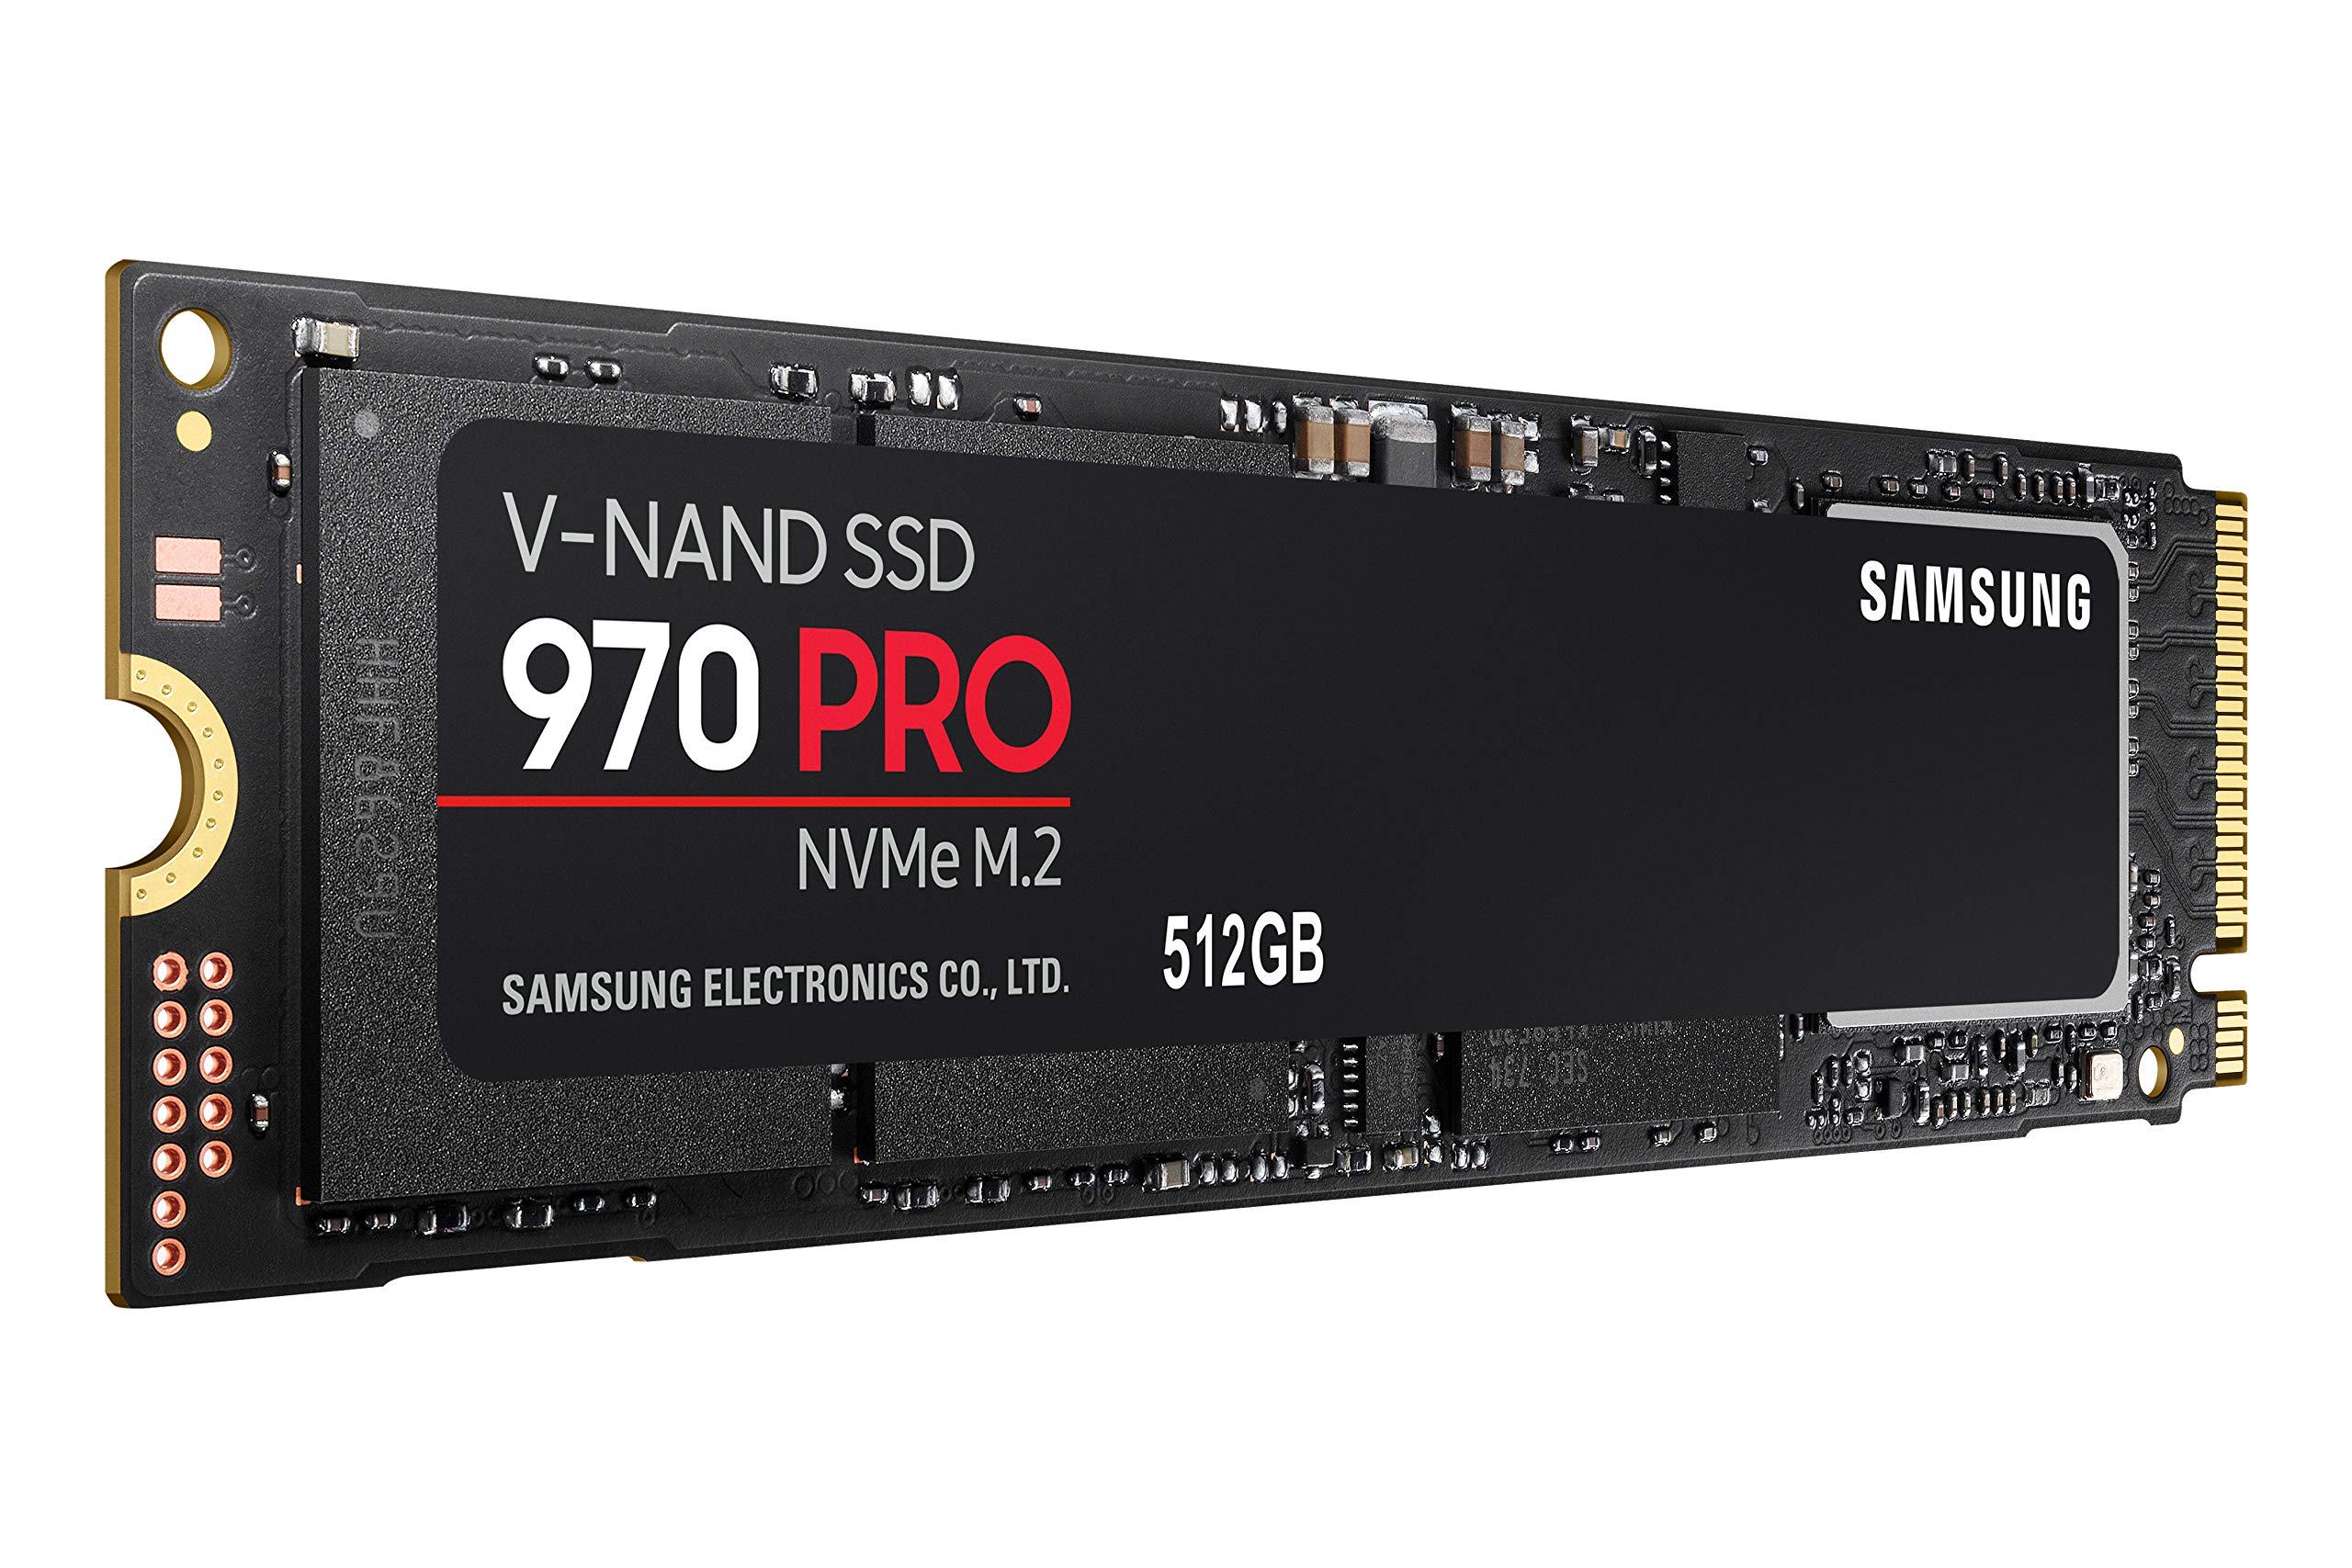 Samsung-970-PRO-512-GB-NVMe-M2-Internal-SSD